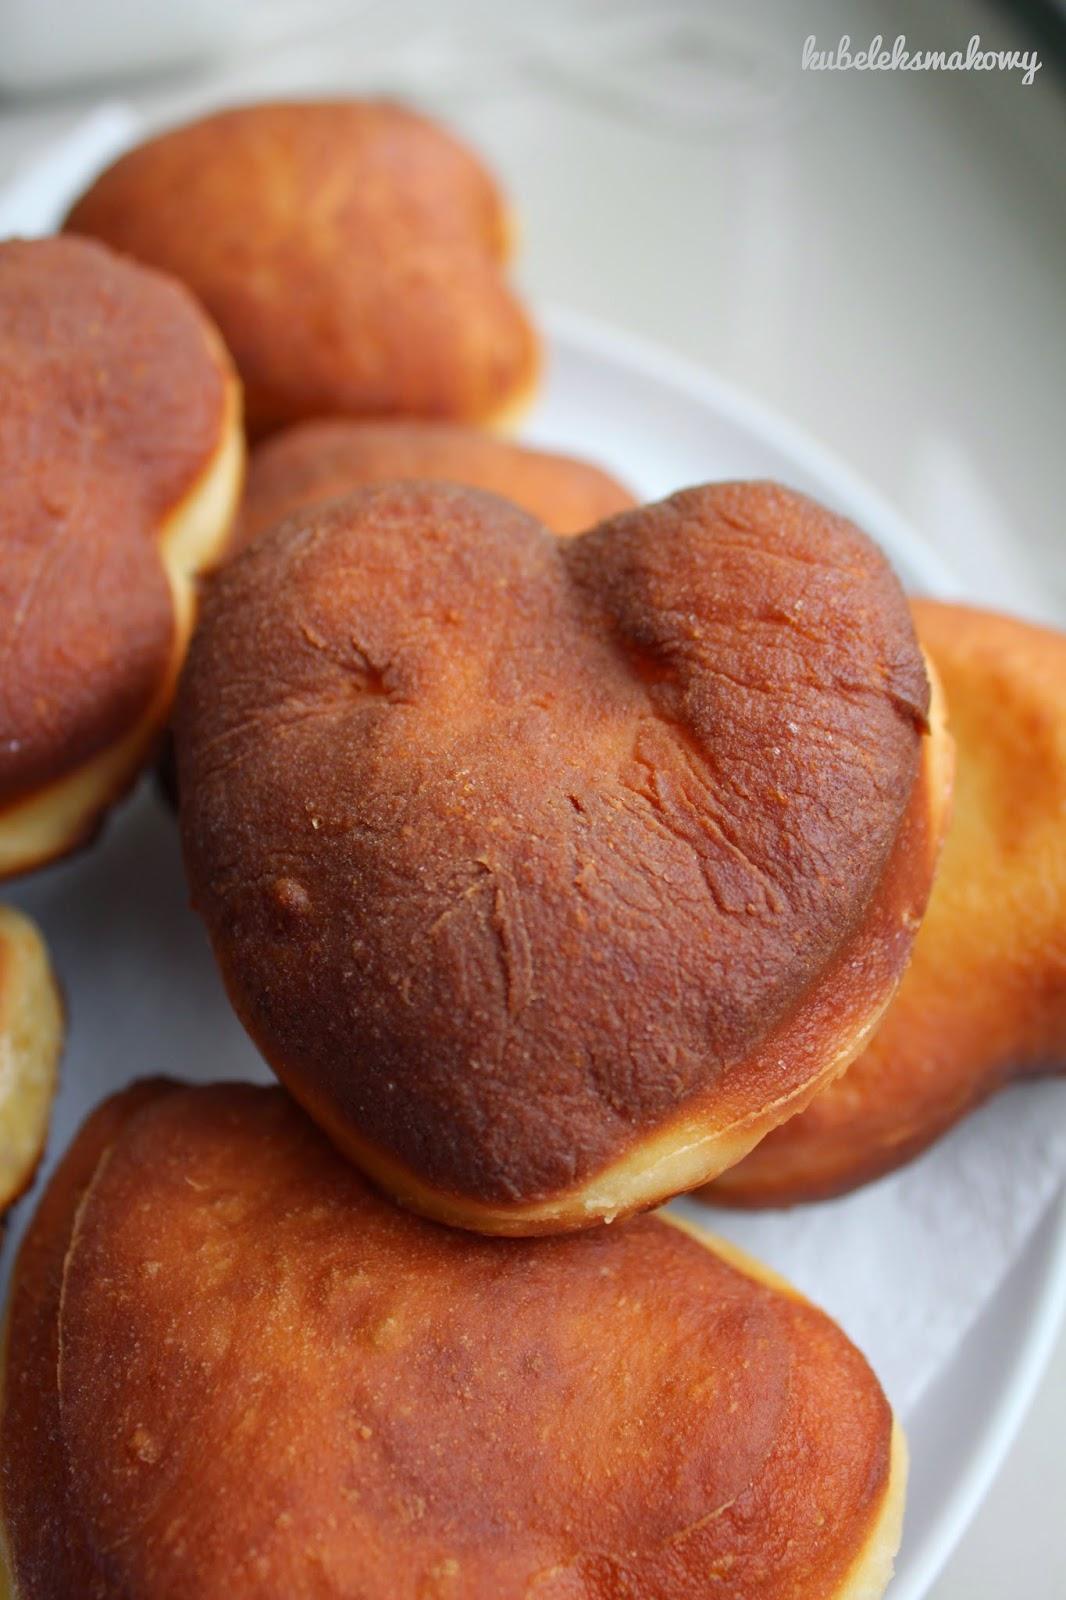 Pączki-serca na żółtkach